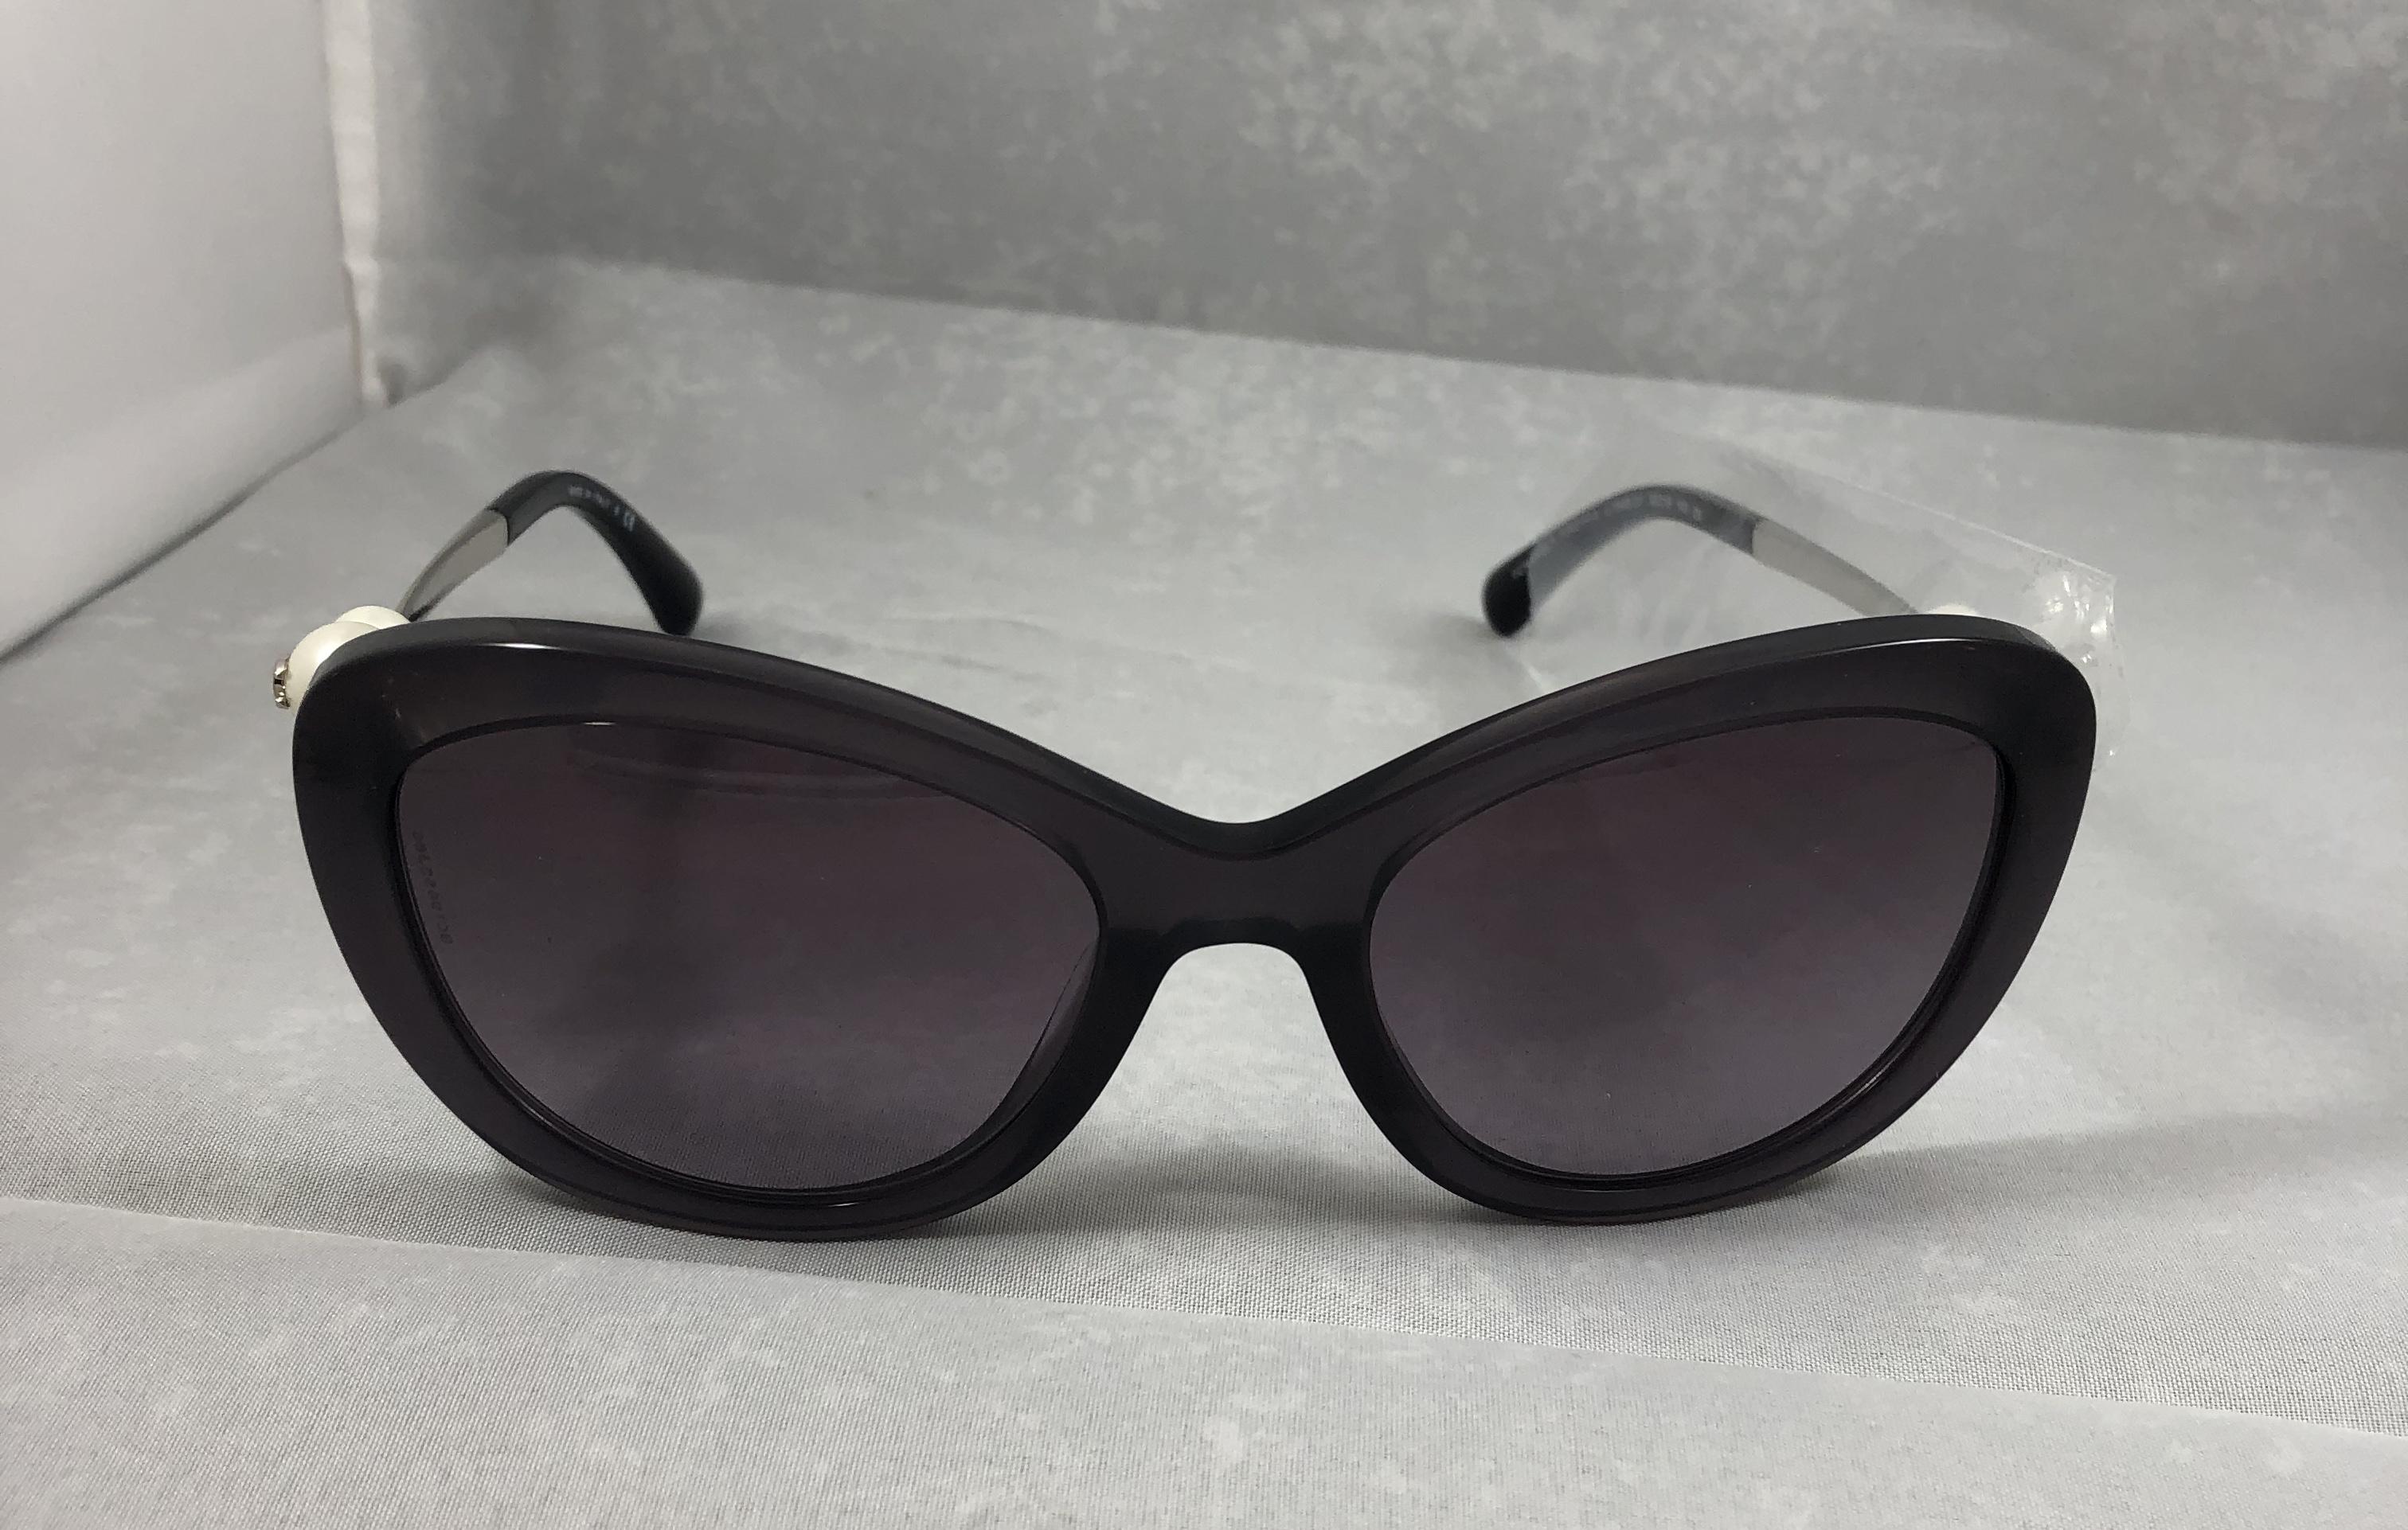 48bba872fc Chanel Fantasy Pearl Women s Sunglasses 5340H C.1548 S1 on Storenvy